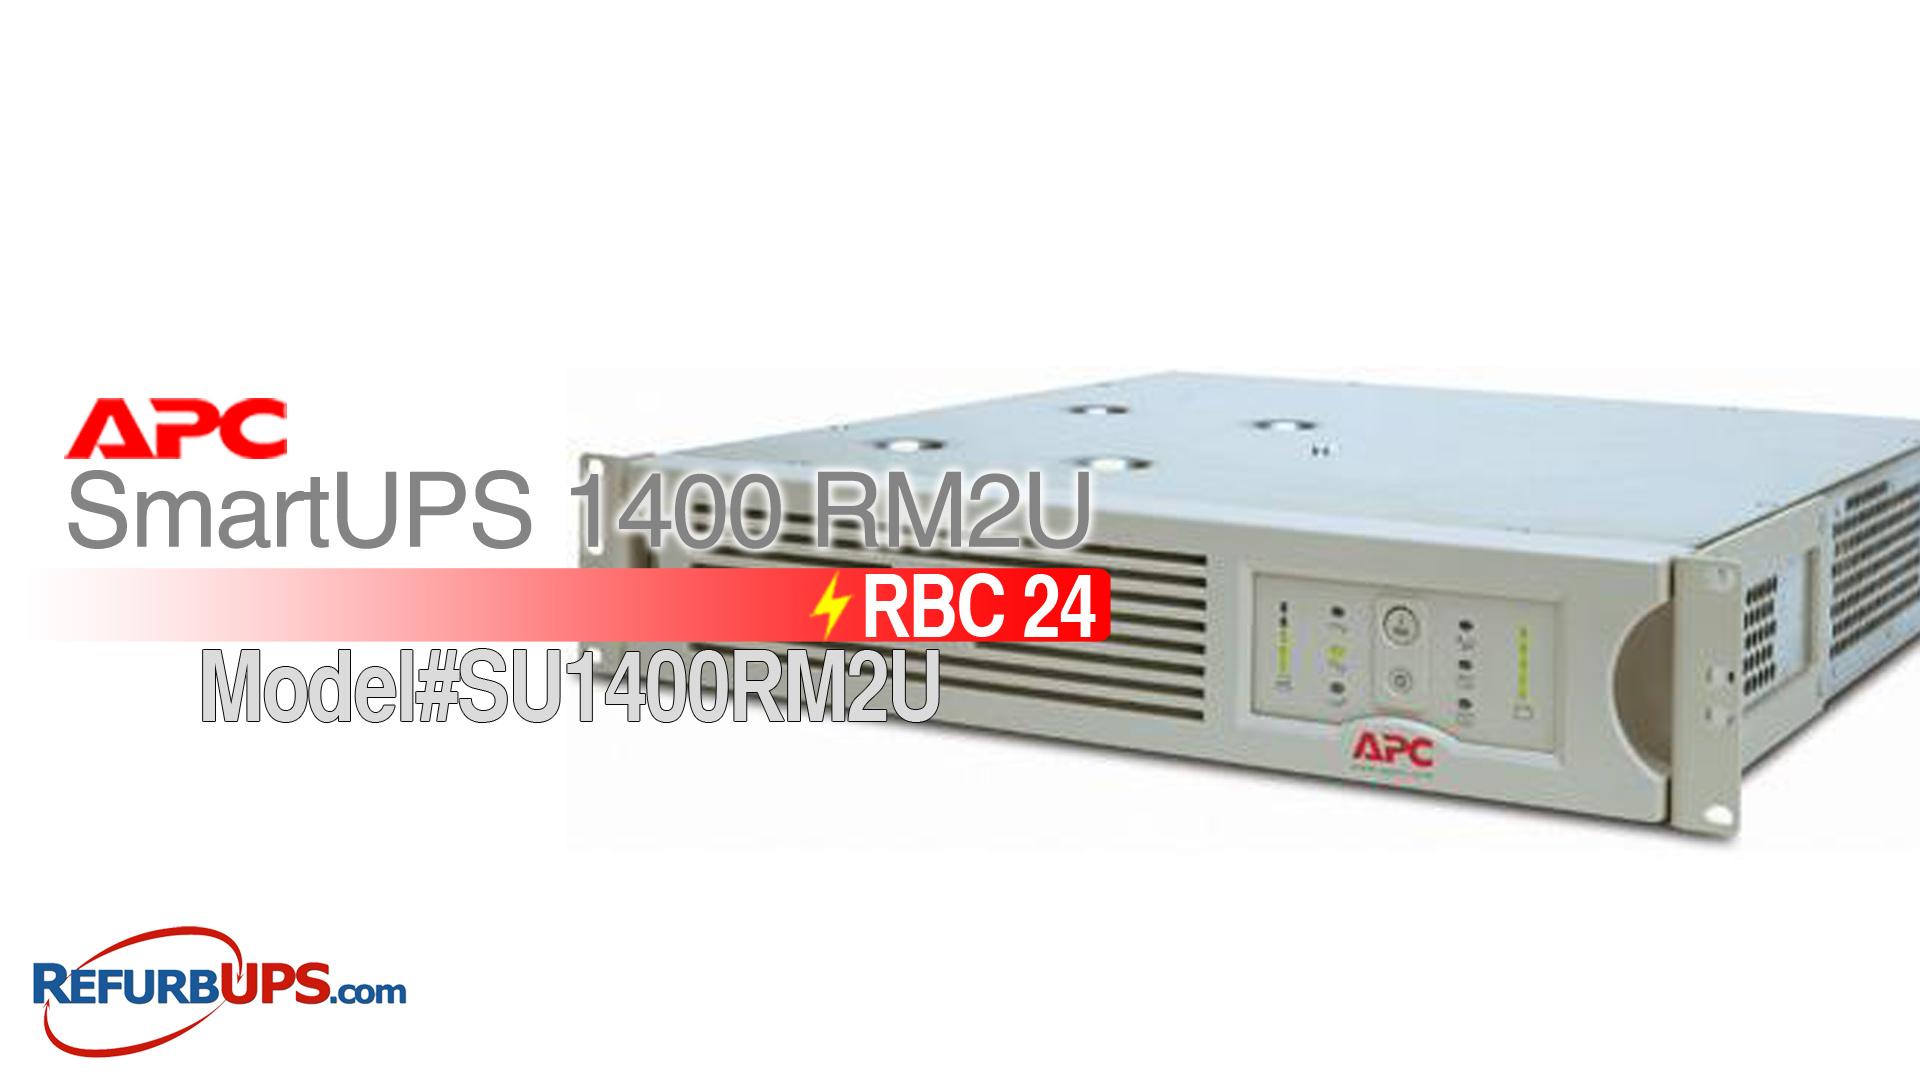 APC RBC 23 in APC SmartUPS 14002U